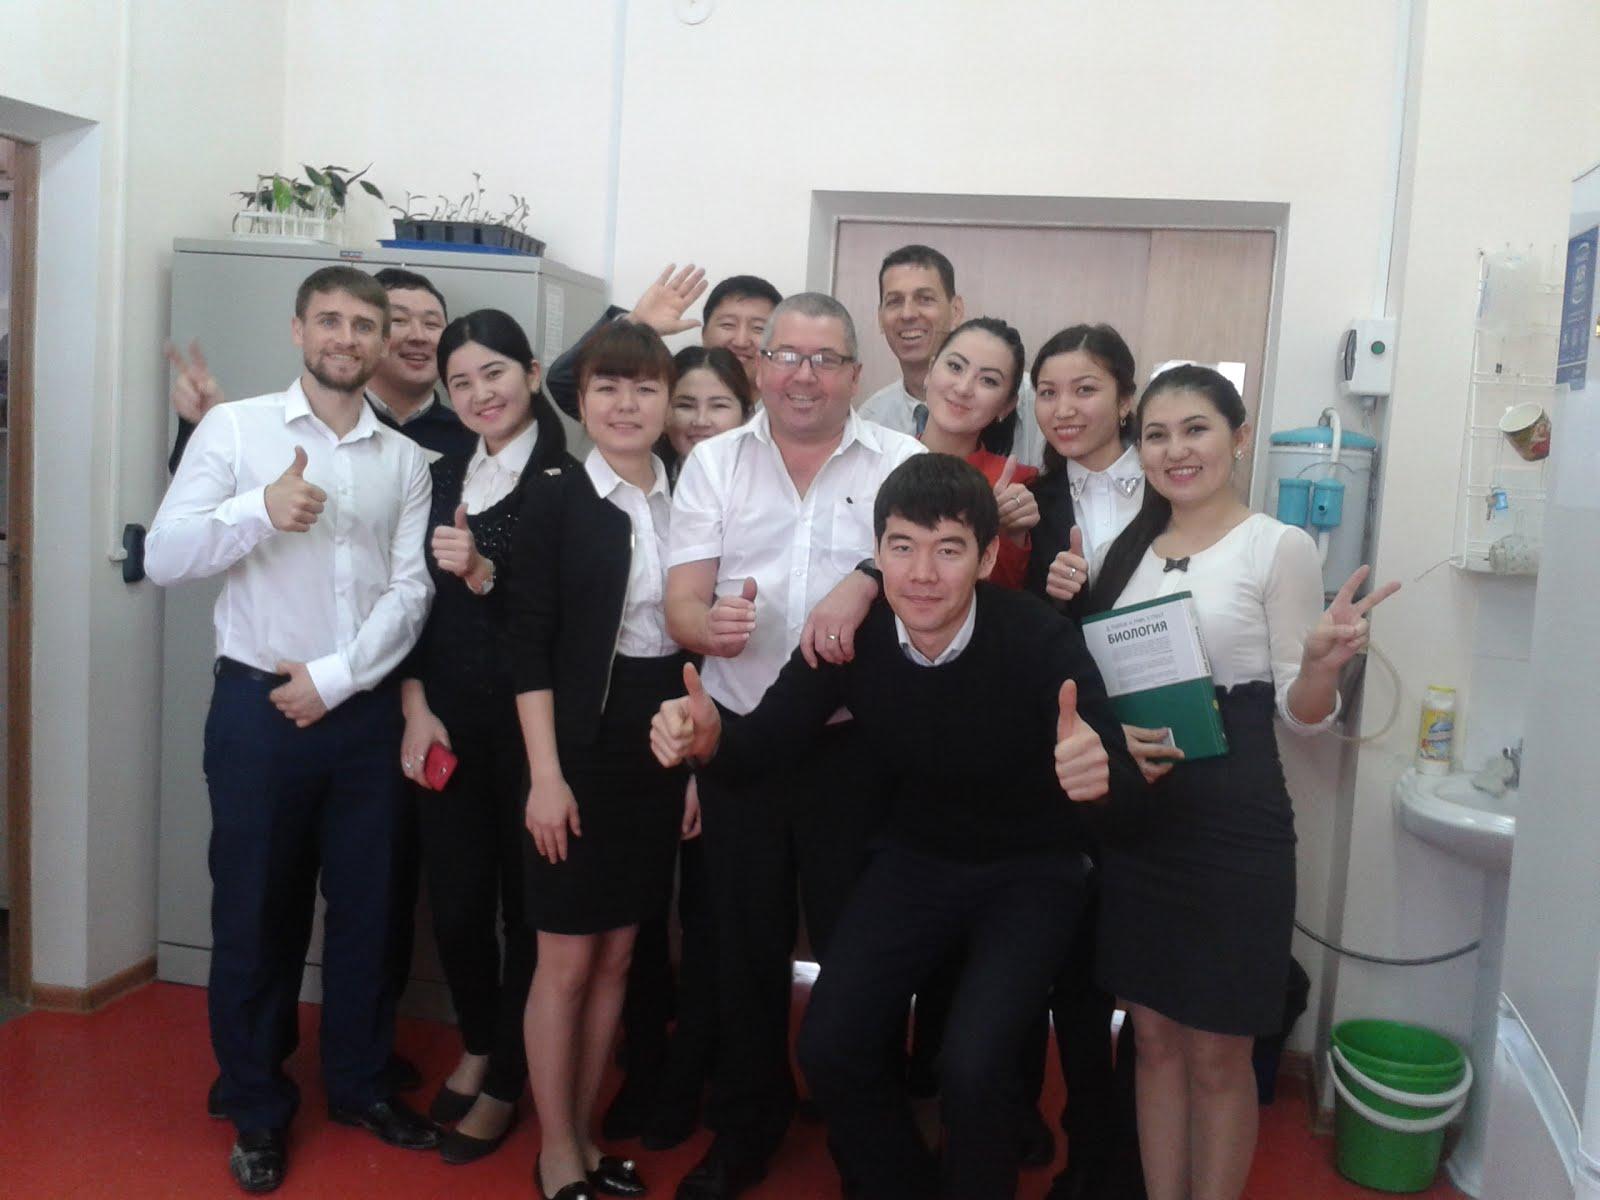 Teaching colleagues in Kazakhstan